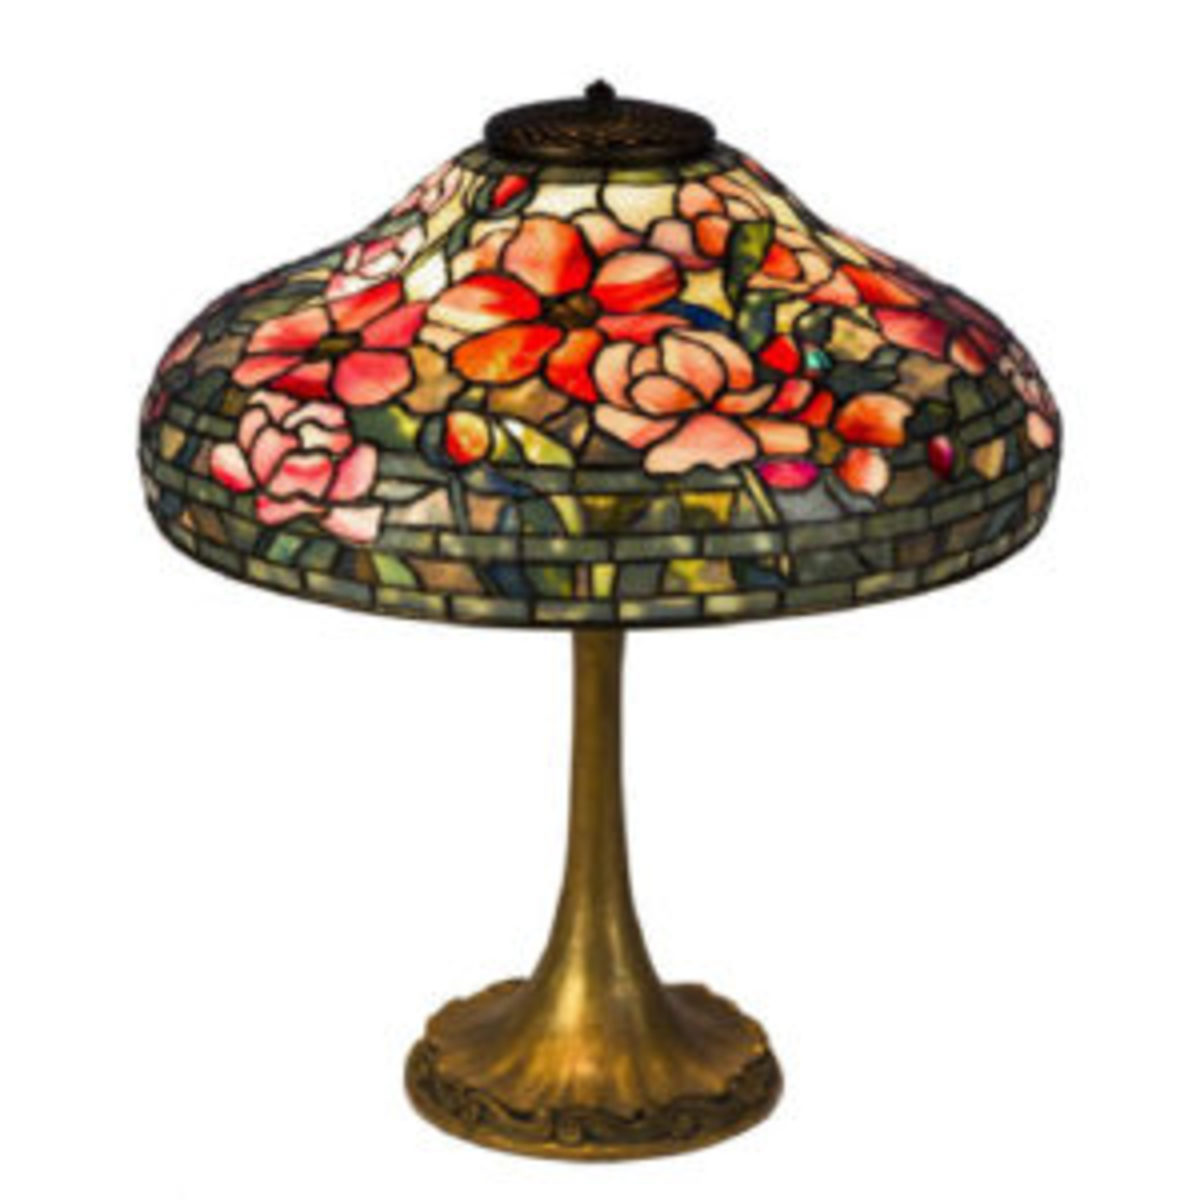 Peony lamp